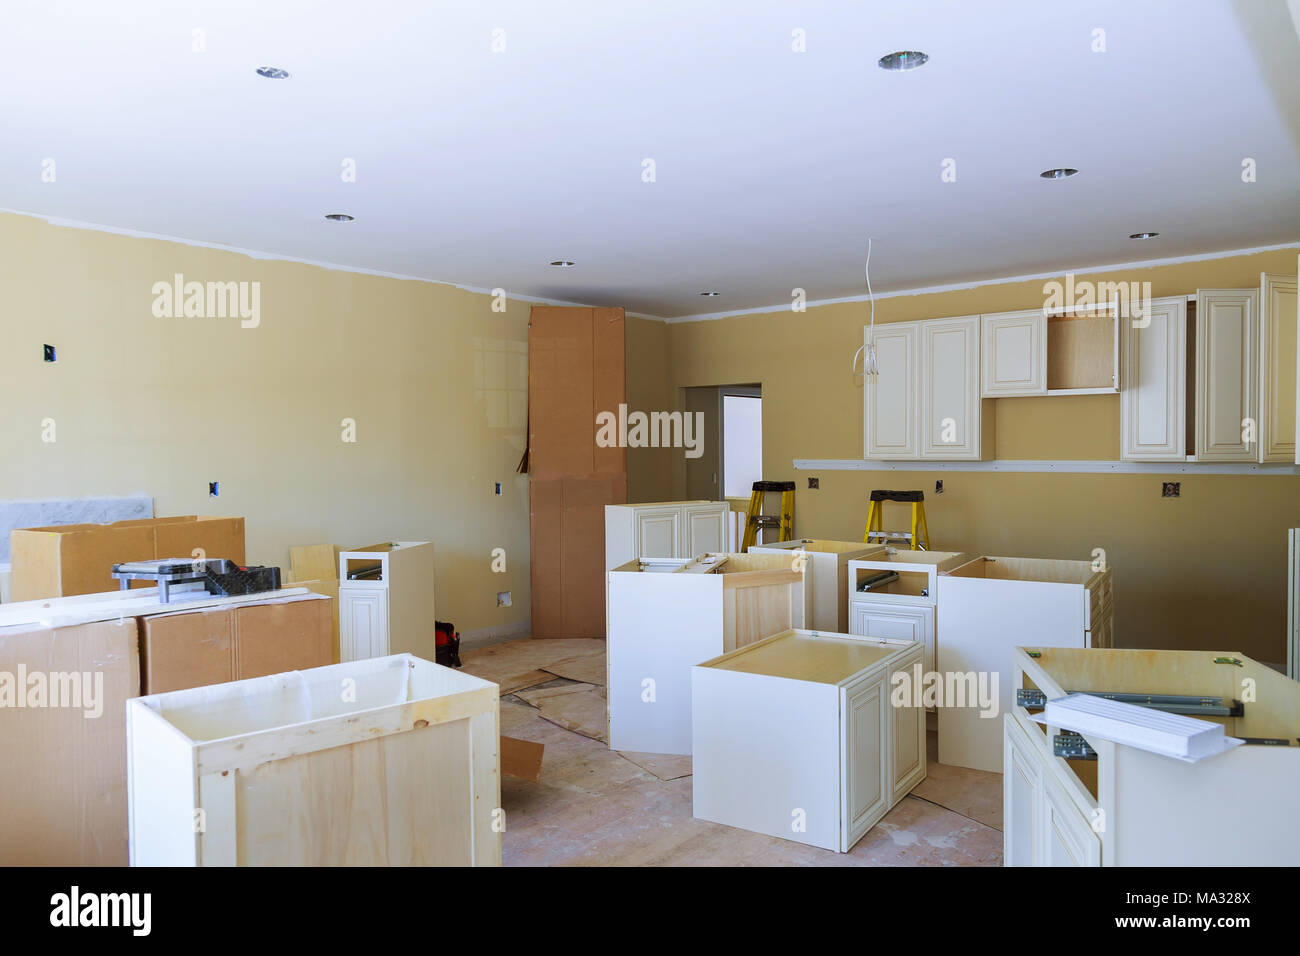 Stove Building Stockfotos & Stove Building Bilder - Seite 3 - Alamy